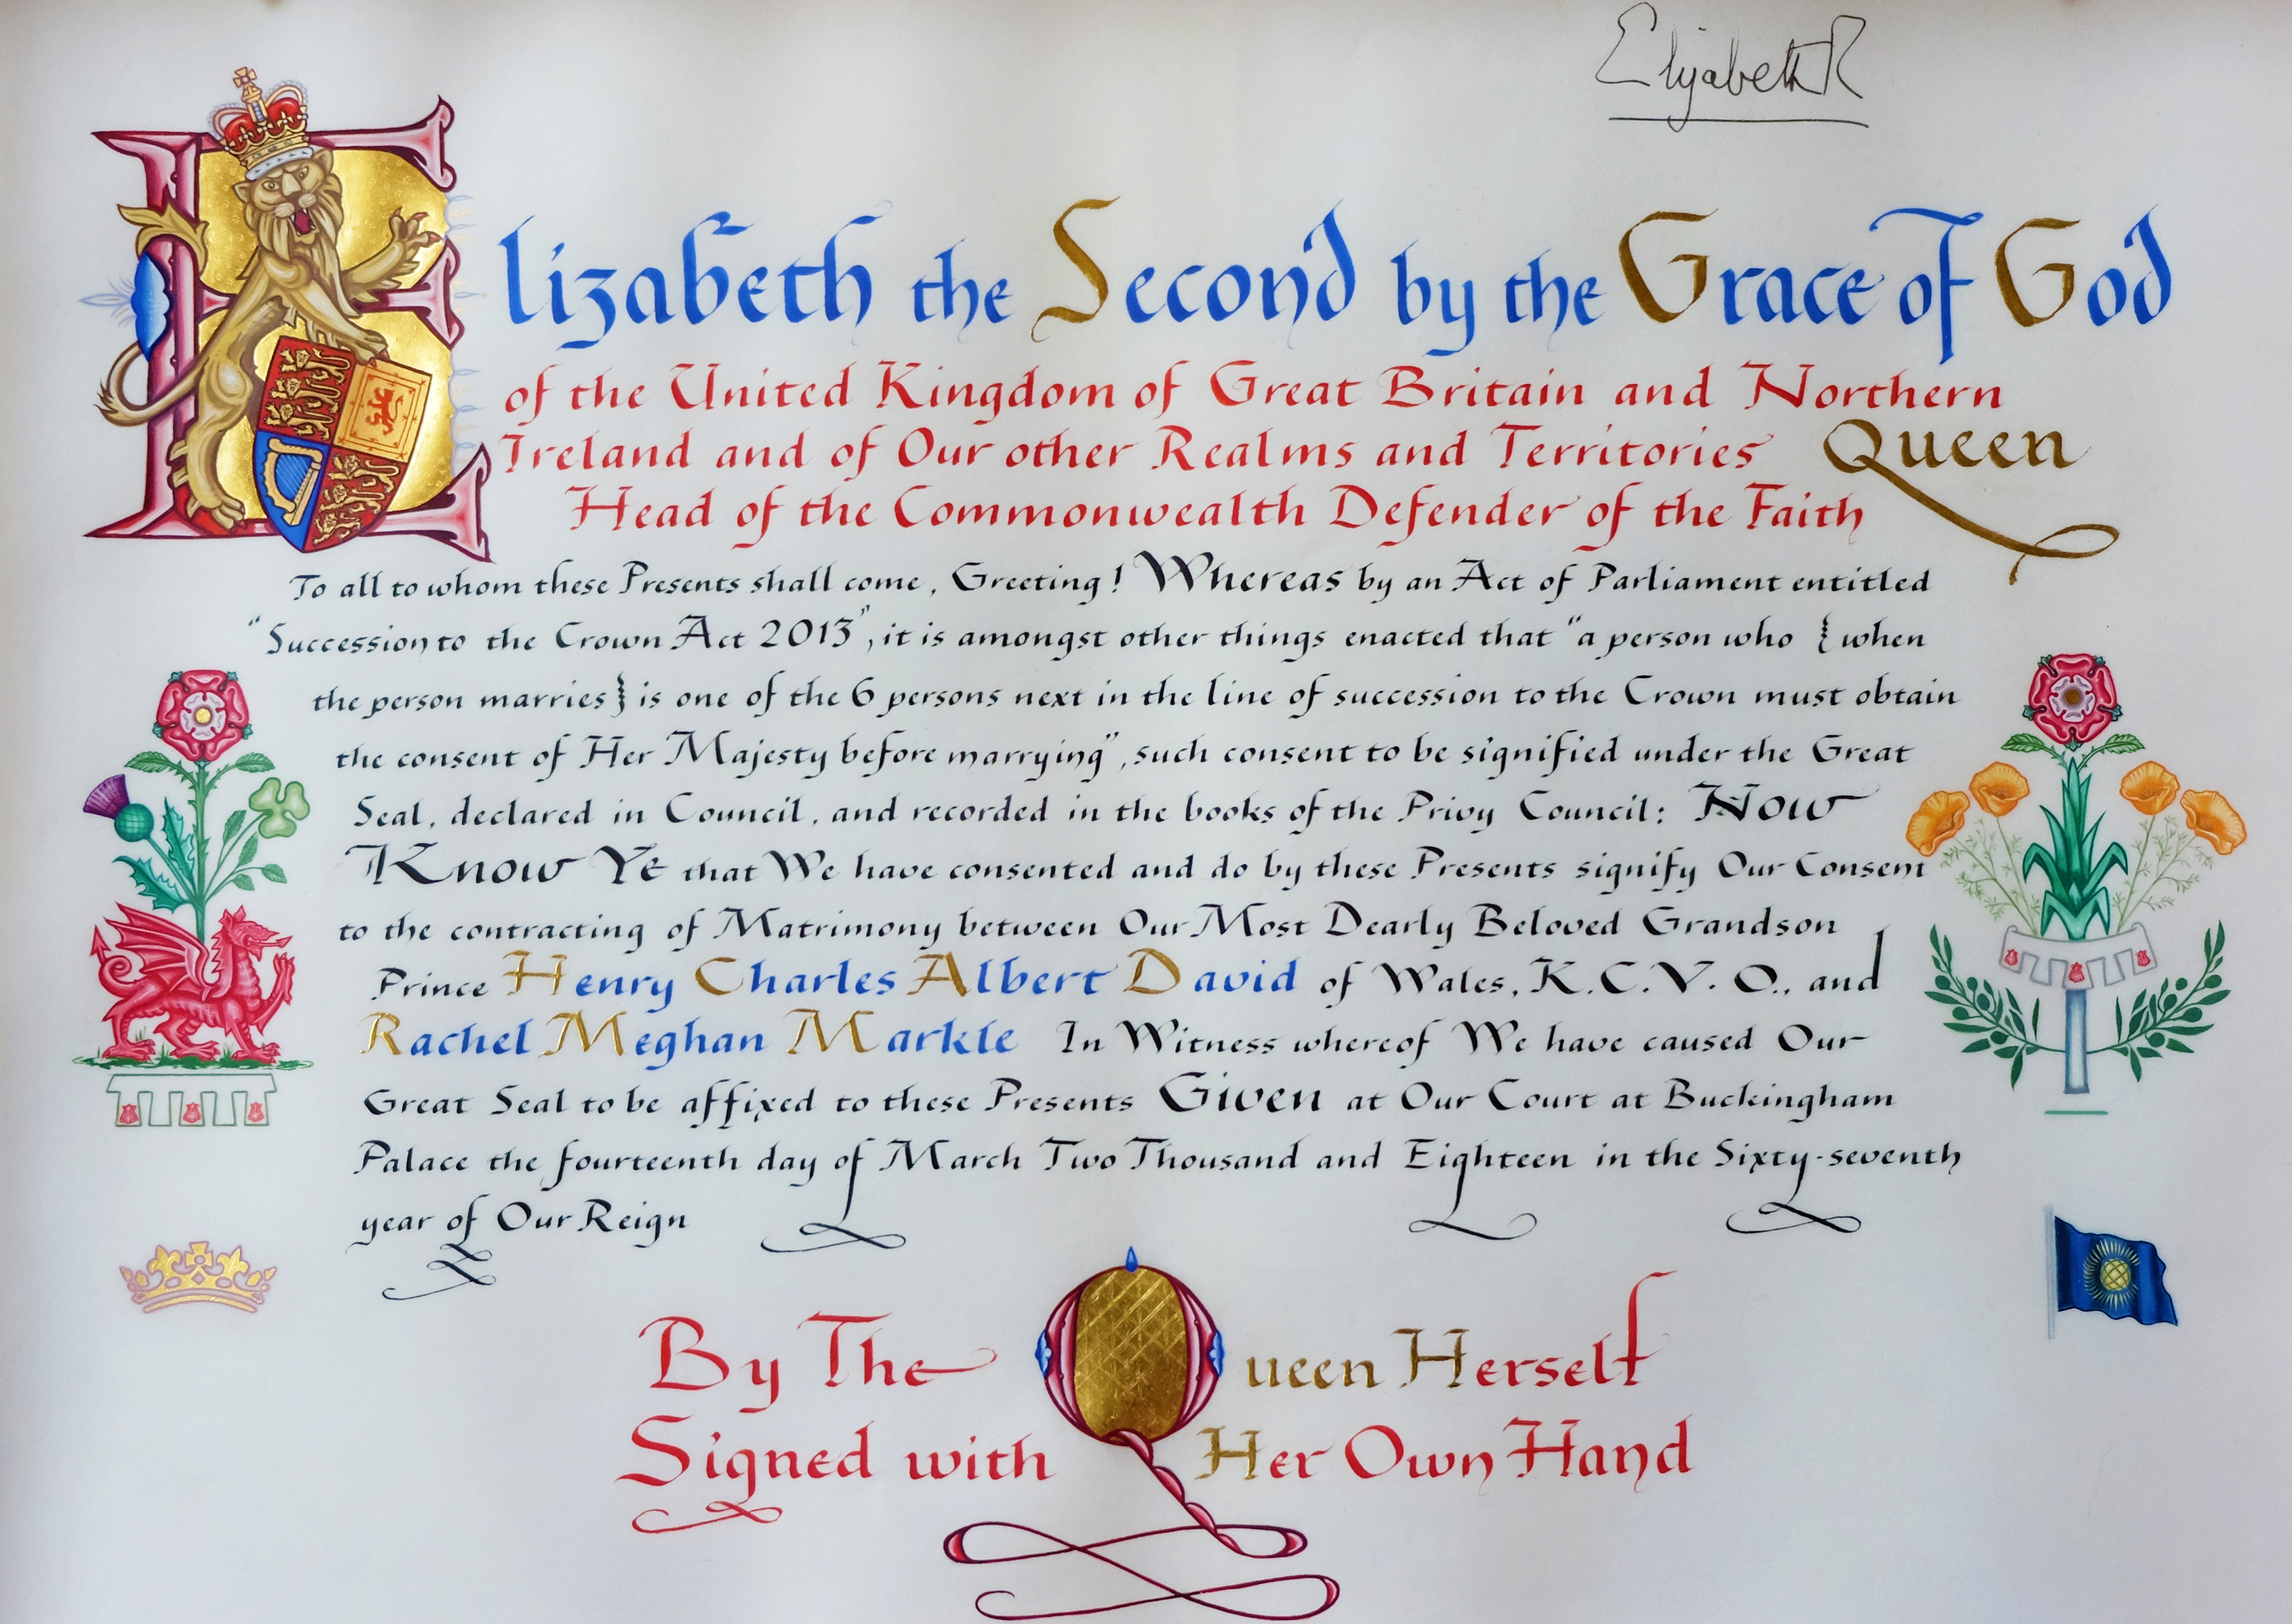 Reina-Isabel-II-consentimiento-boda-harry-meghan